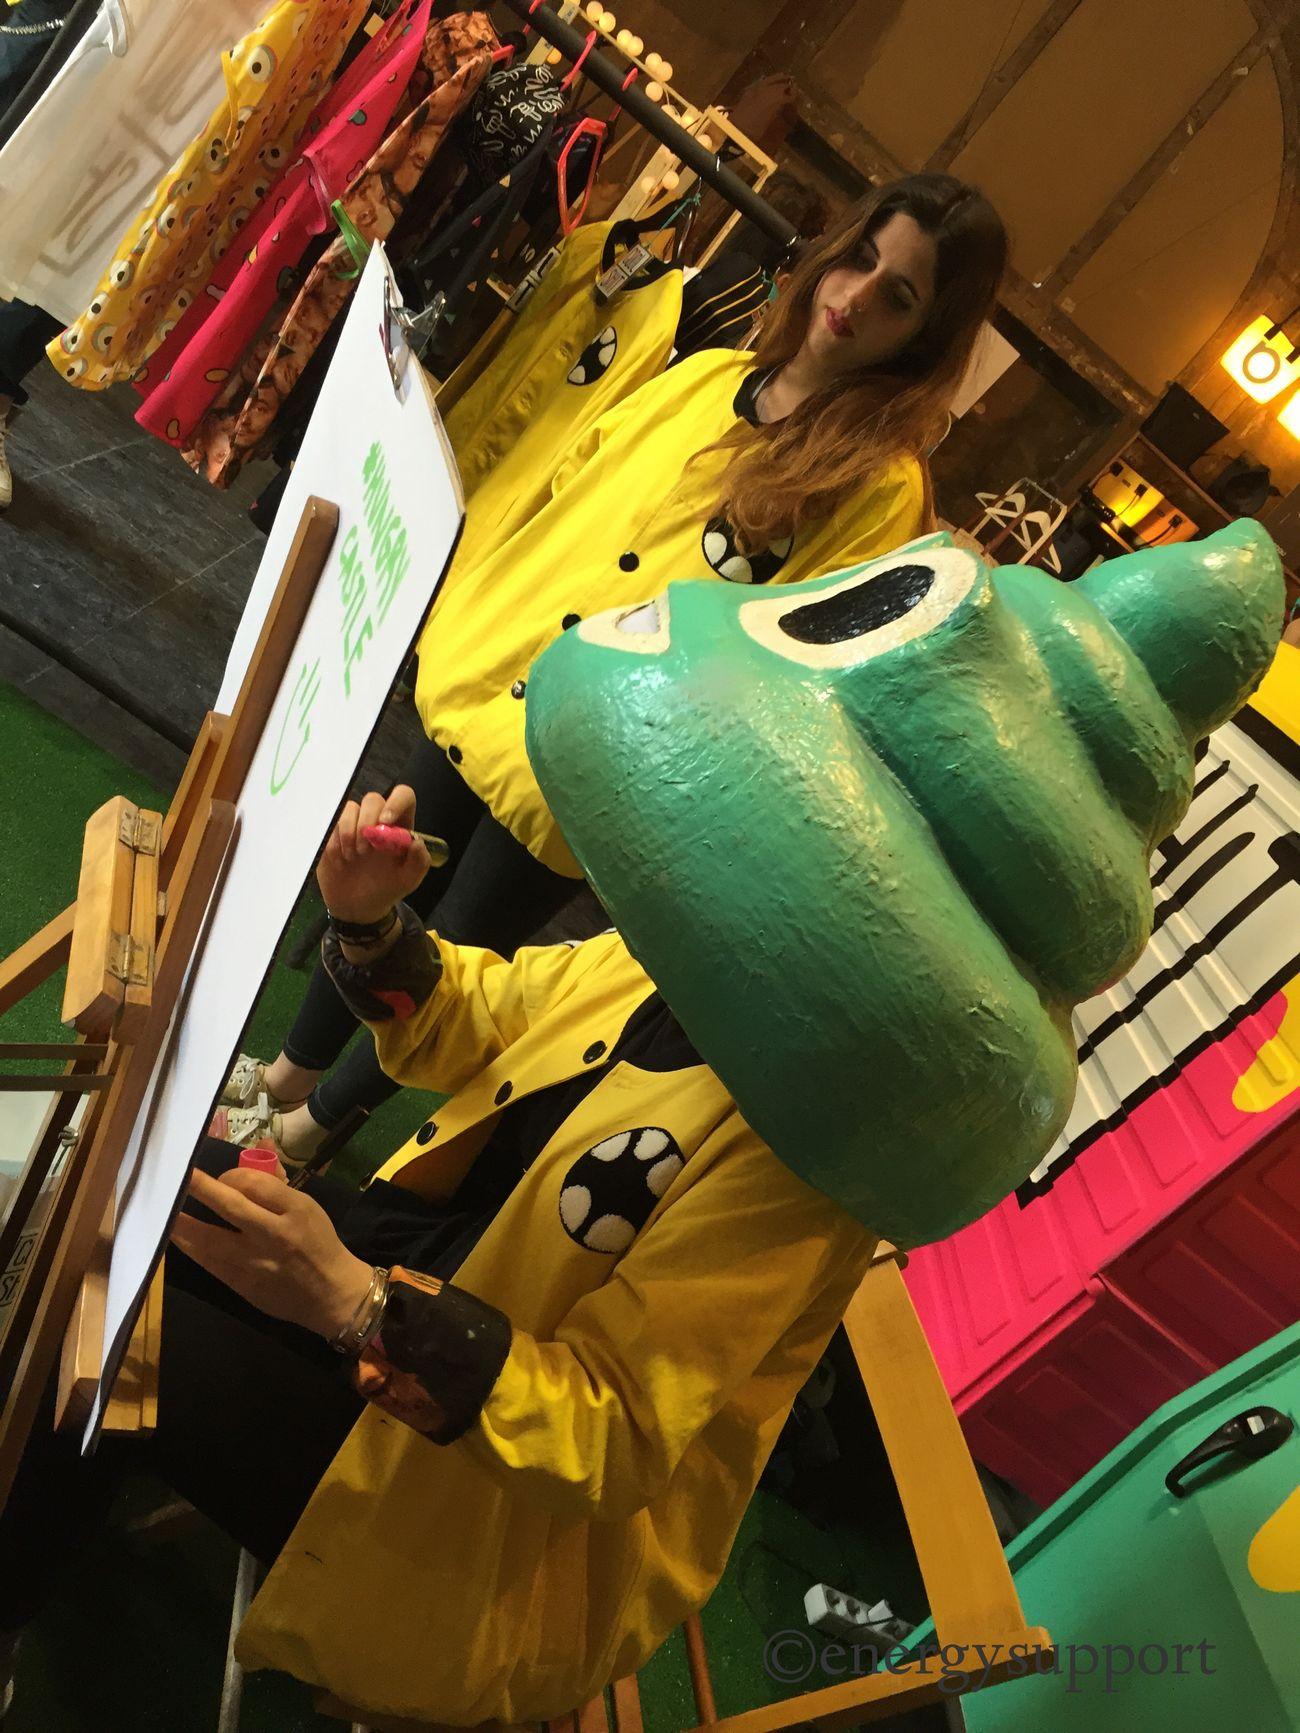 😅😅💩😅😅 @baltasar71 @esther_arumi @ateliervintage50 😂😂😂@energysupport @hungrycastle #hungrycastle #sandraenergysupport #barcelona #PaloAltoMarket @borisrimbau #scoopcomunicacion Hungrycastle Paloaltomarket Streetmarket Cool Portrait Sandraenergysupport